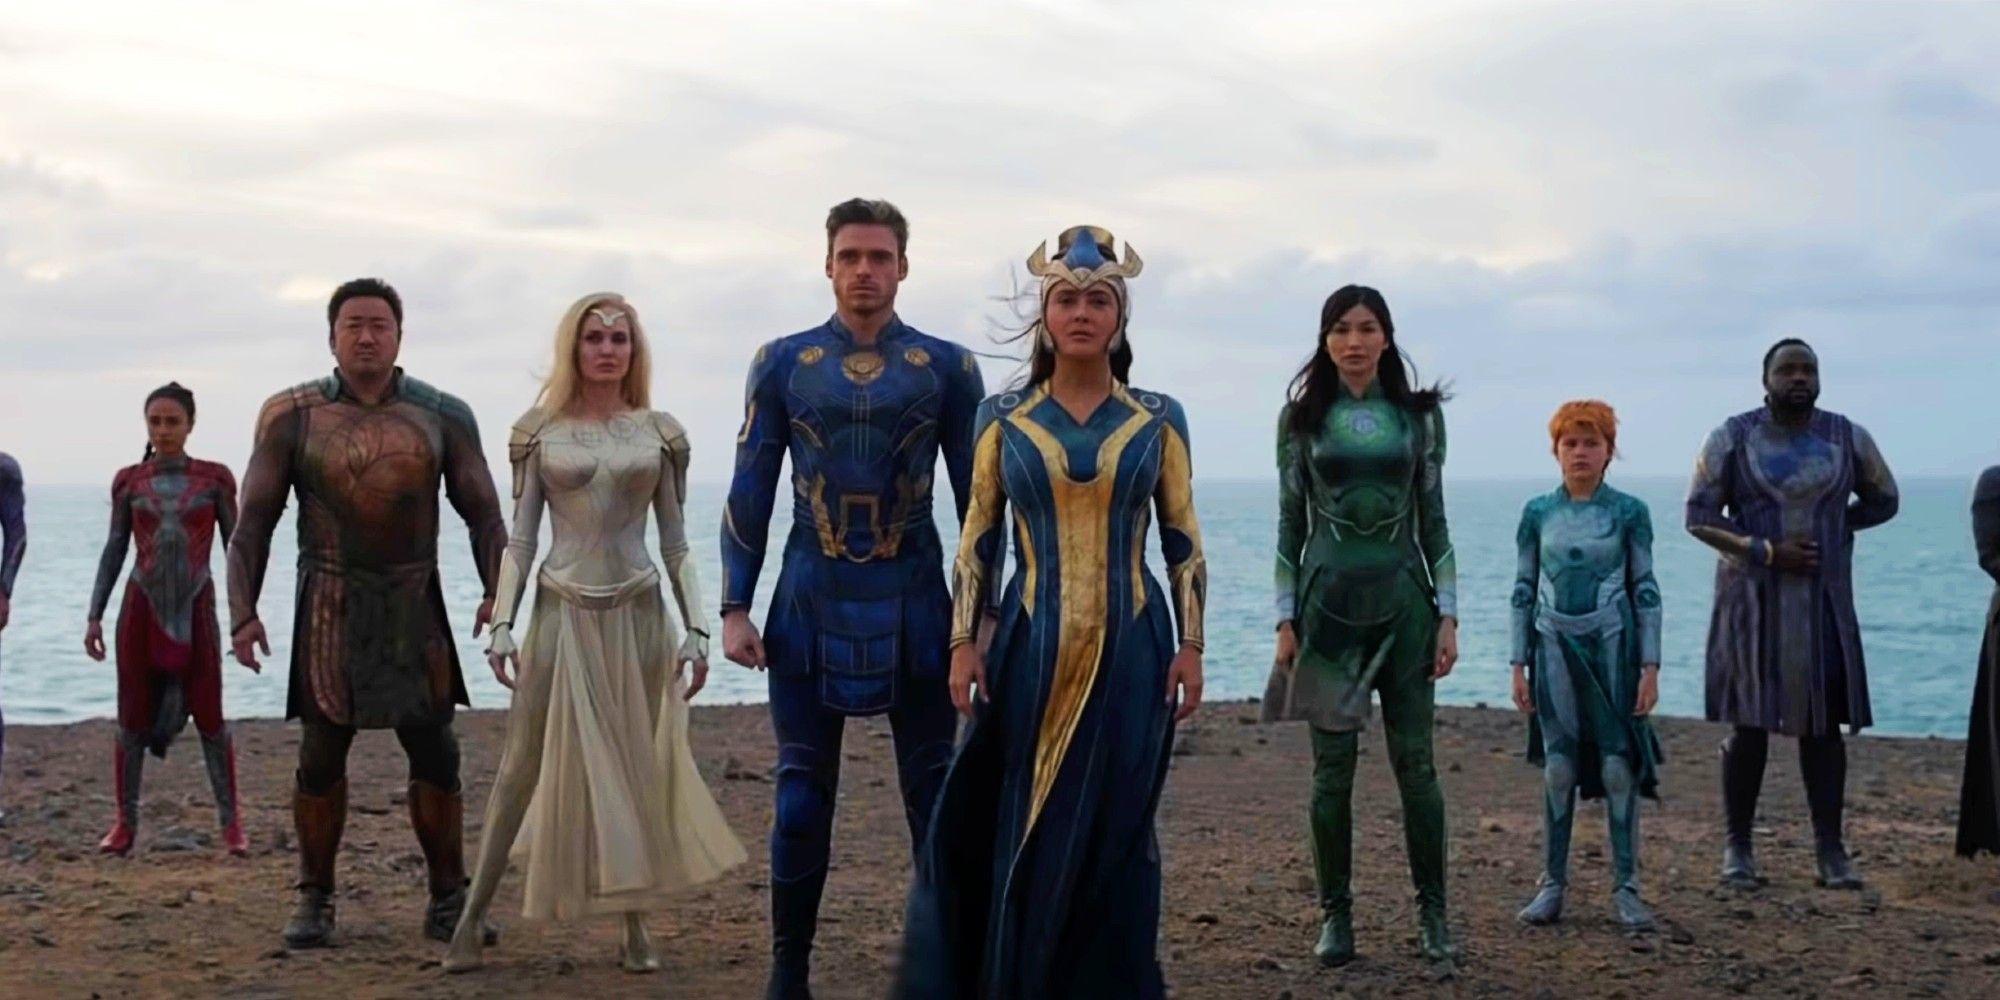 Eternals Movie Trailer Reveals Marvel's Ancient Superhero Team In Full Costume